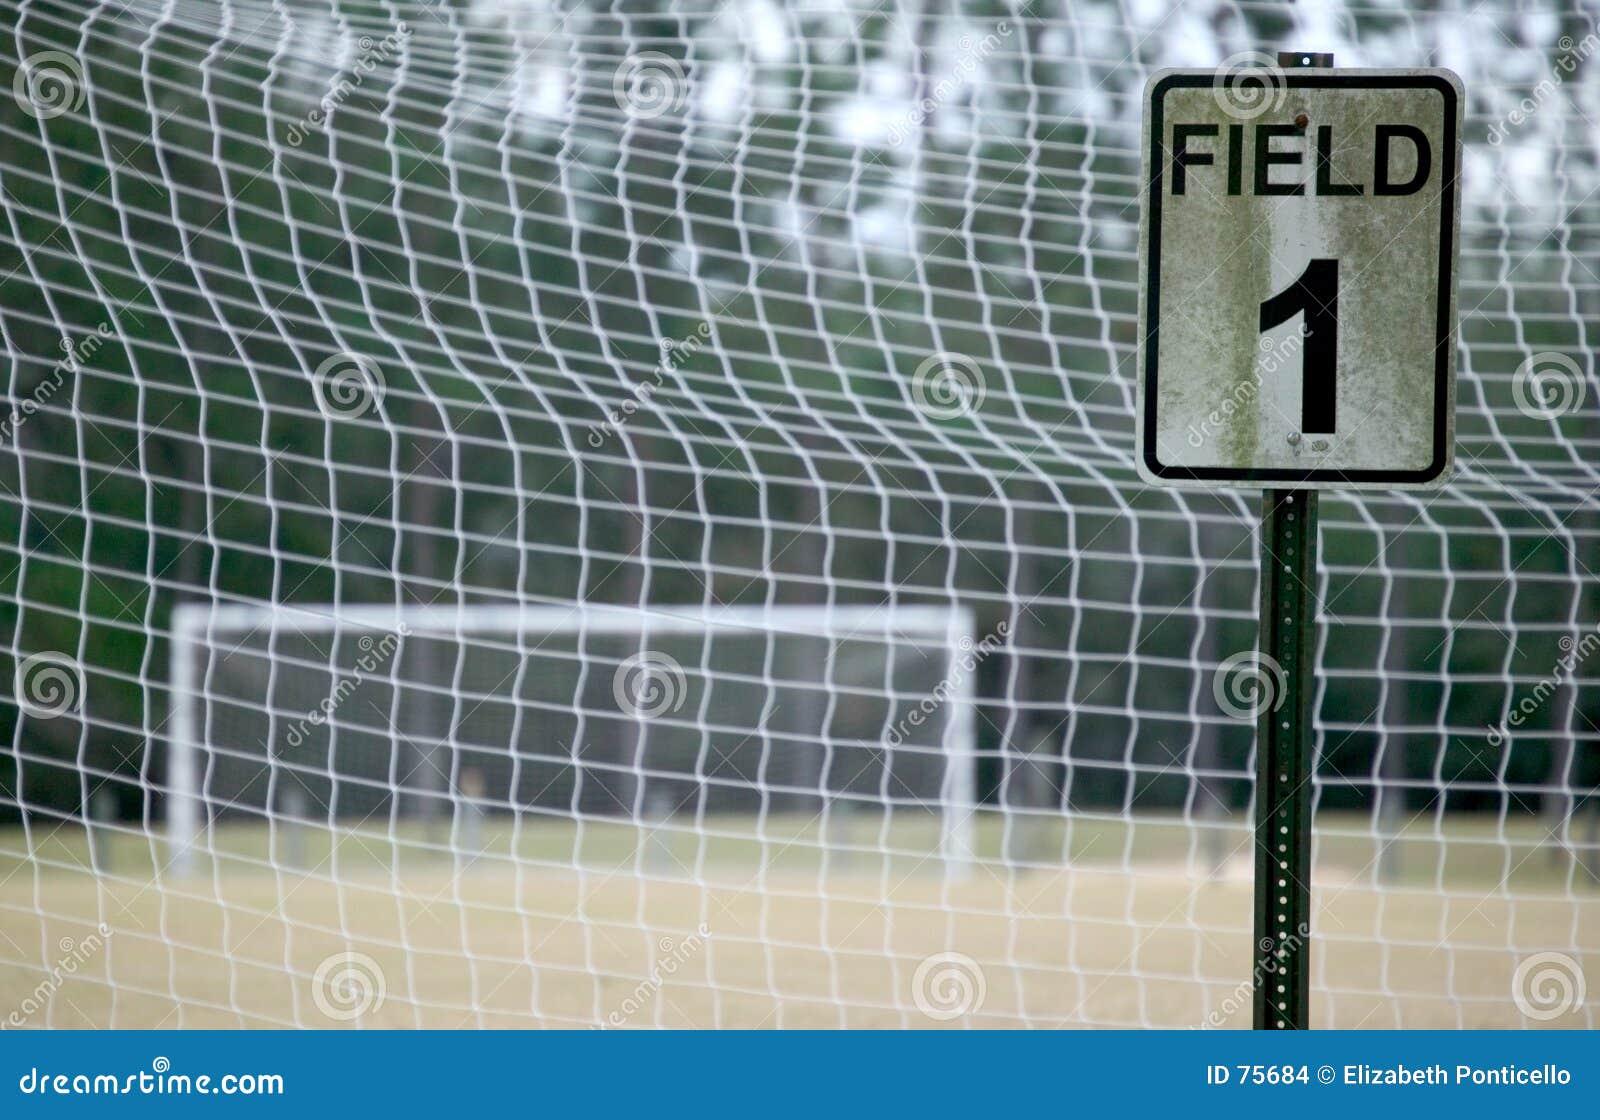 Terrain de football 1 - couleur